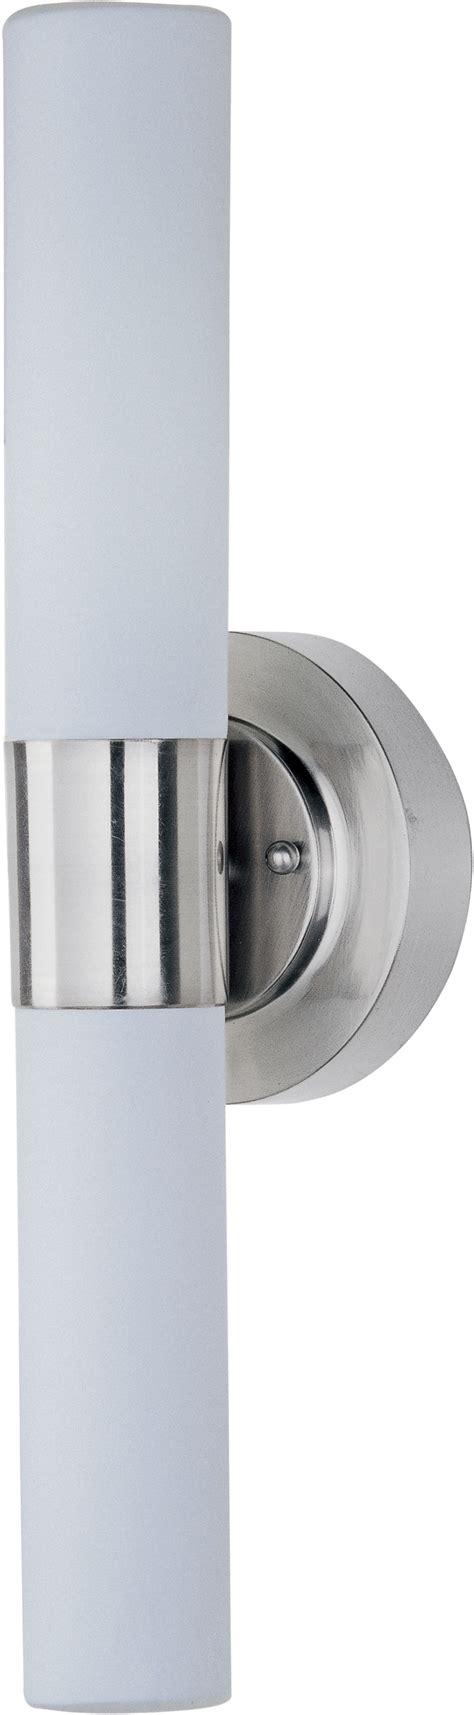 2 bulb bathroom vanity light fixture wall mount with plug wall mount vanity light fixtures cordelia lighting 4